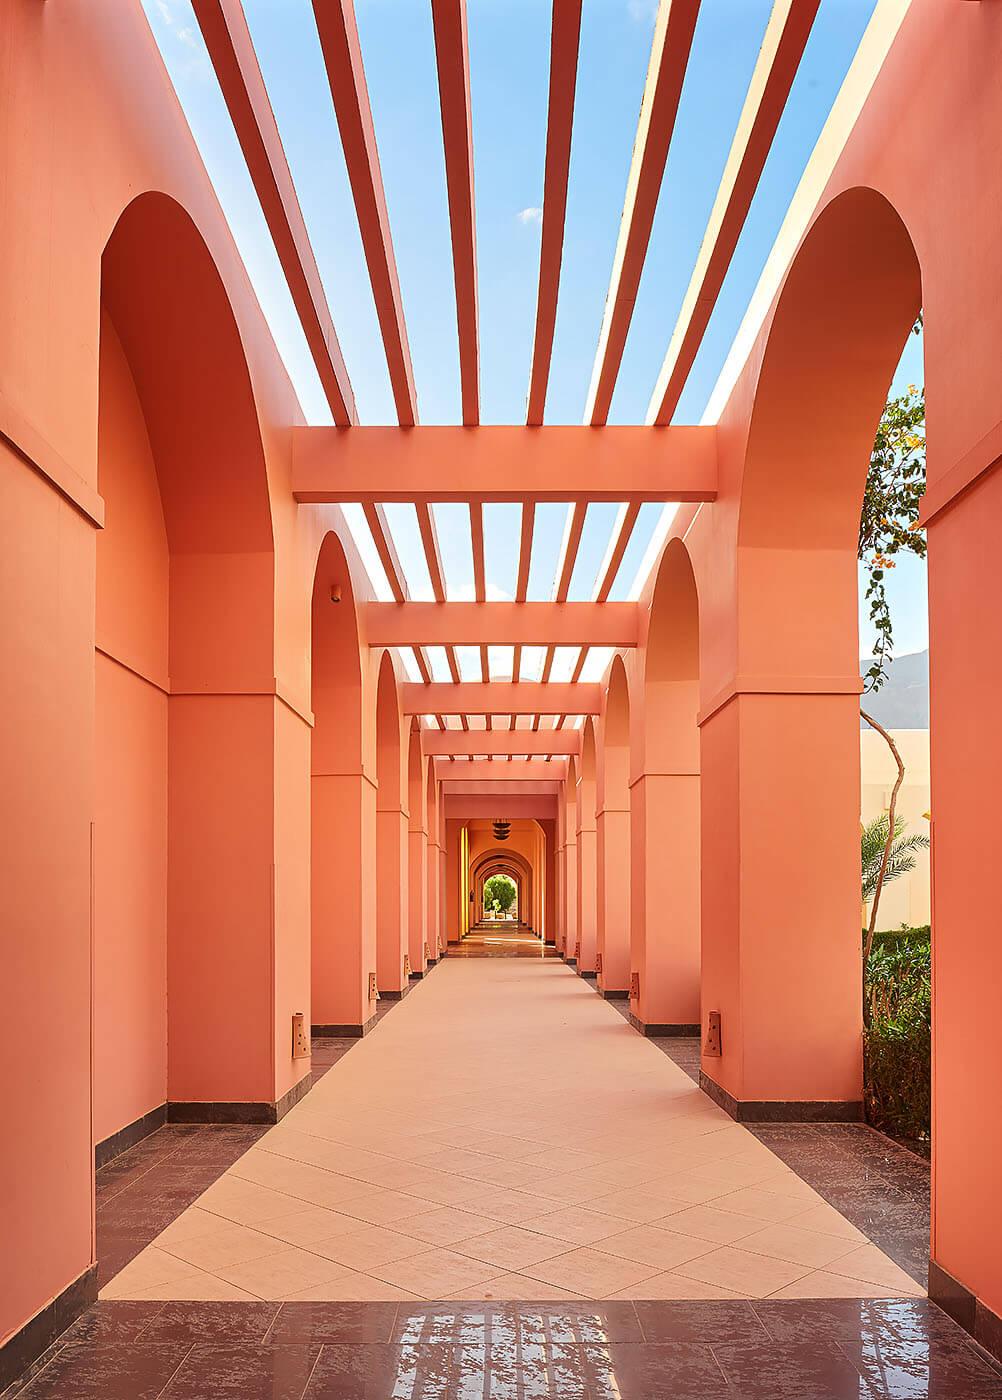 Sofitel Taba Hotel - Symmetry - Mohamed Abdel-Hady Photography